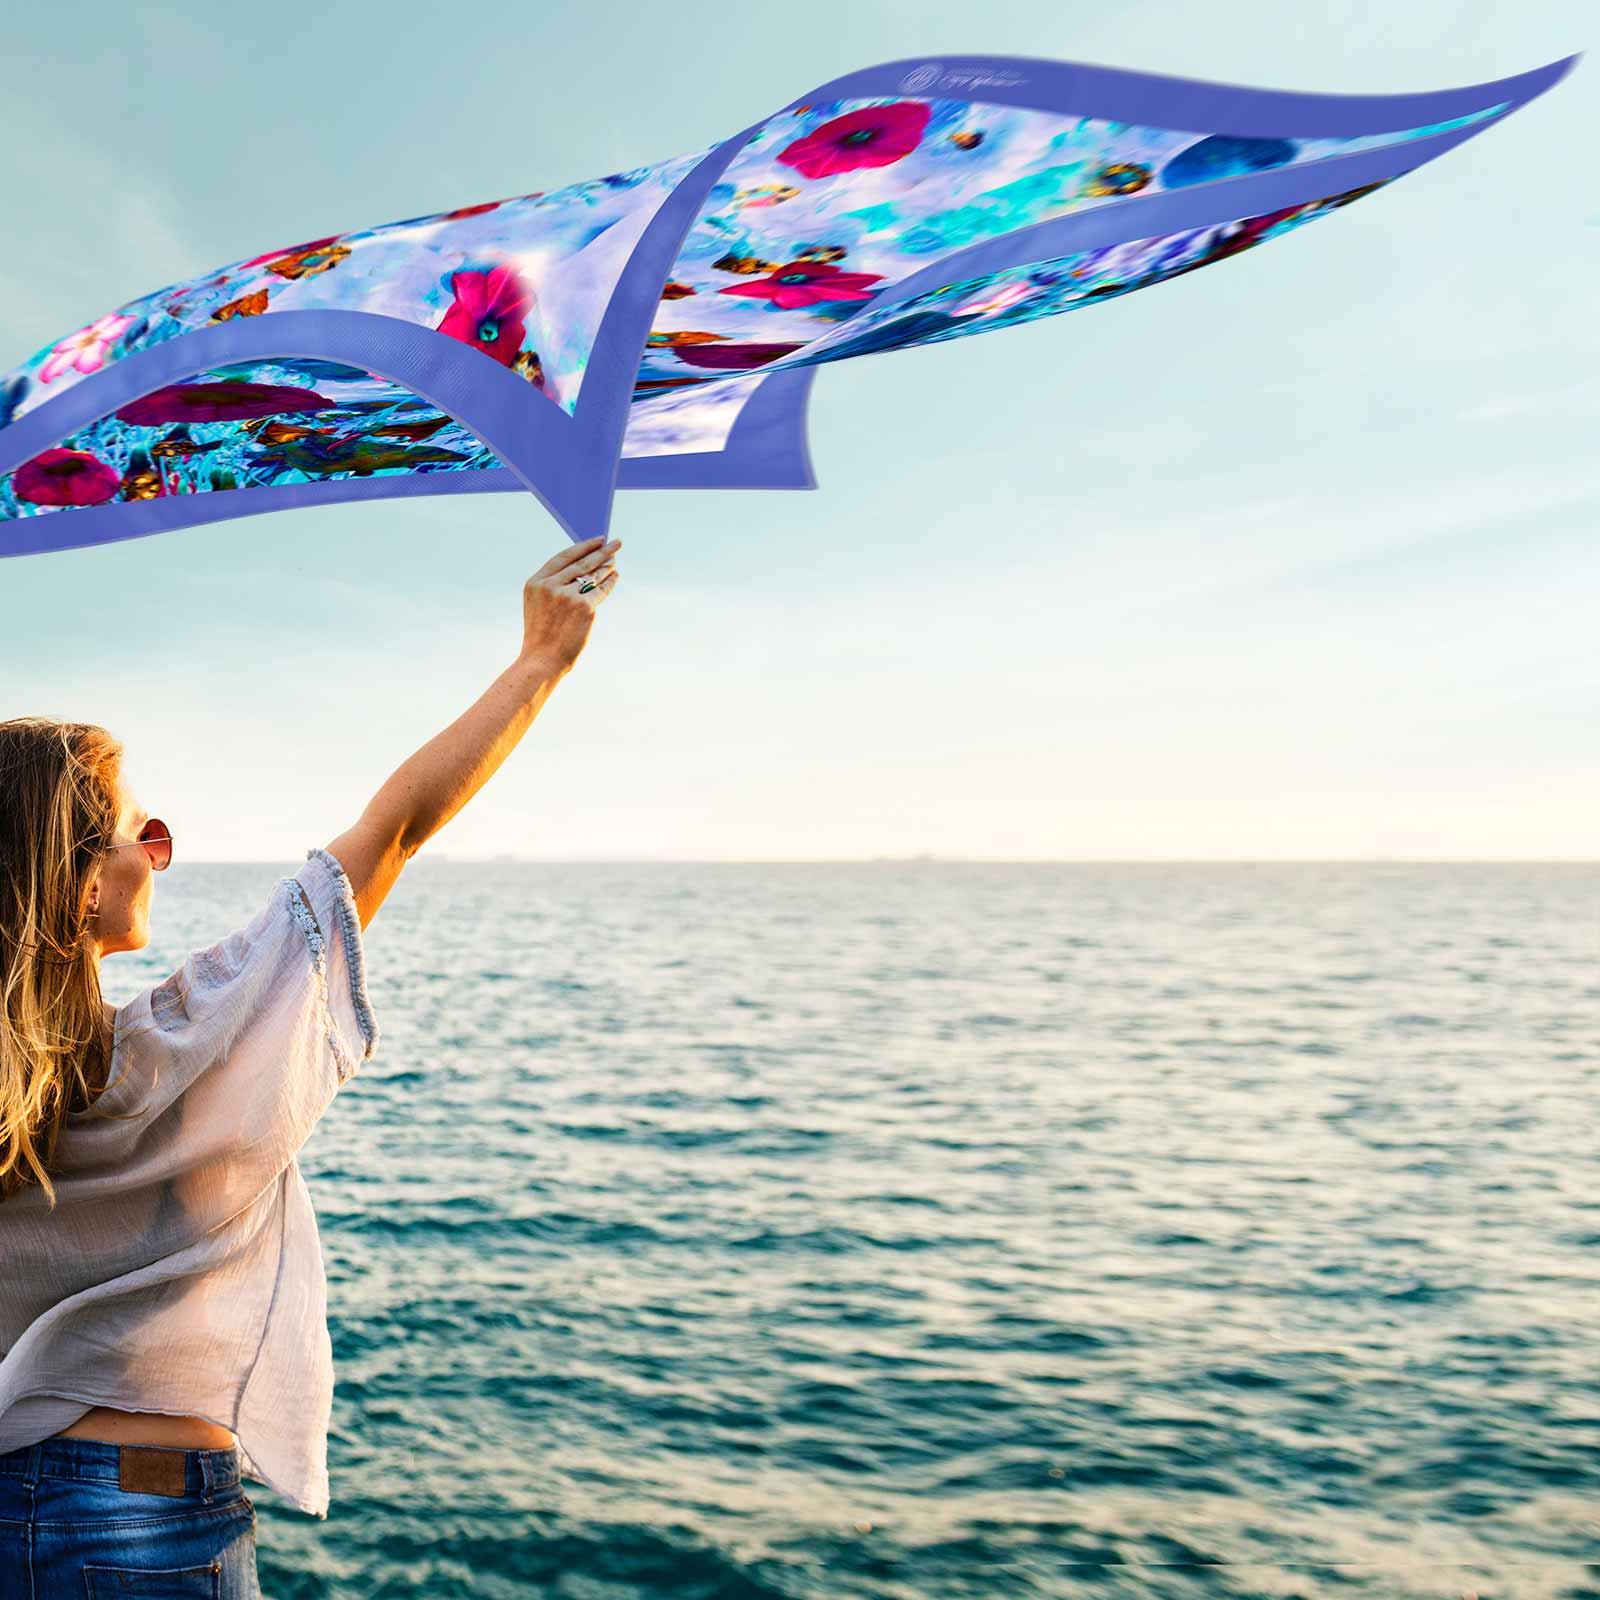 Cornelia Hagman Silk Scarf Sea Wind Woman, Seidenschal, sciarpa di seta, foulard soie,